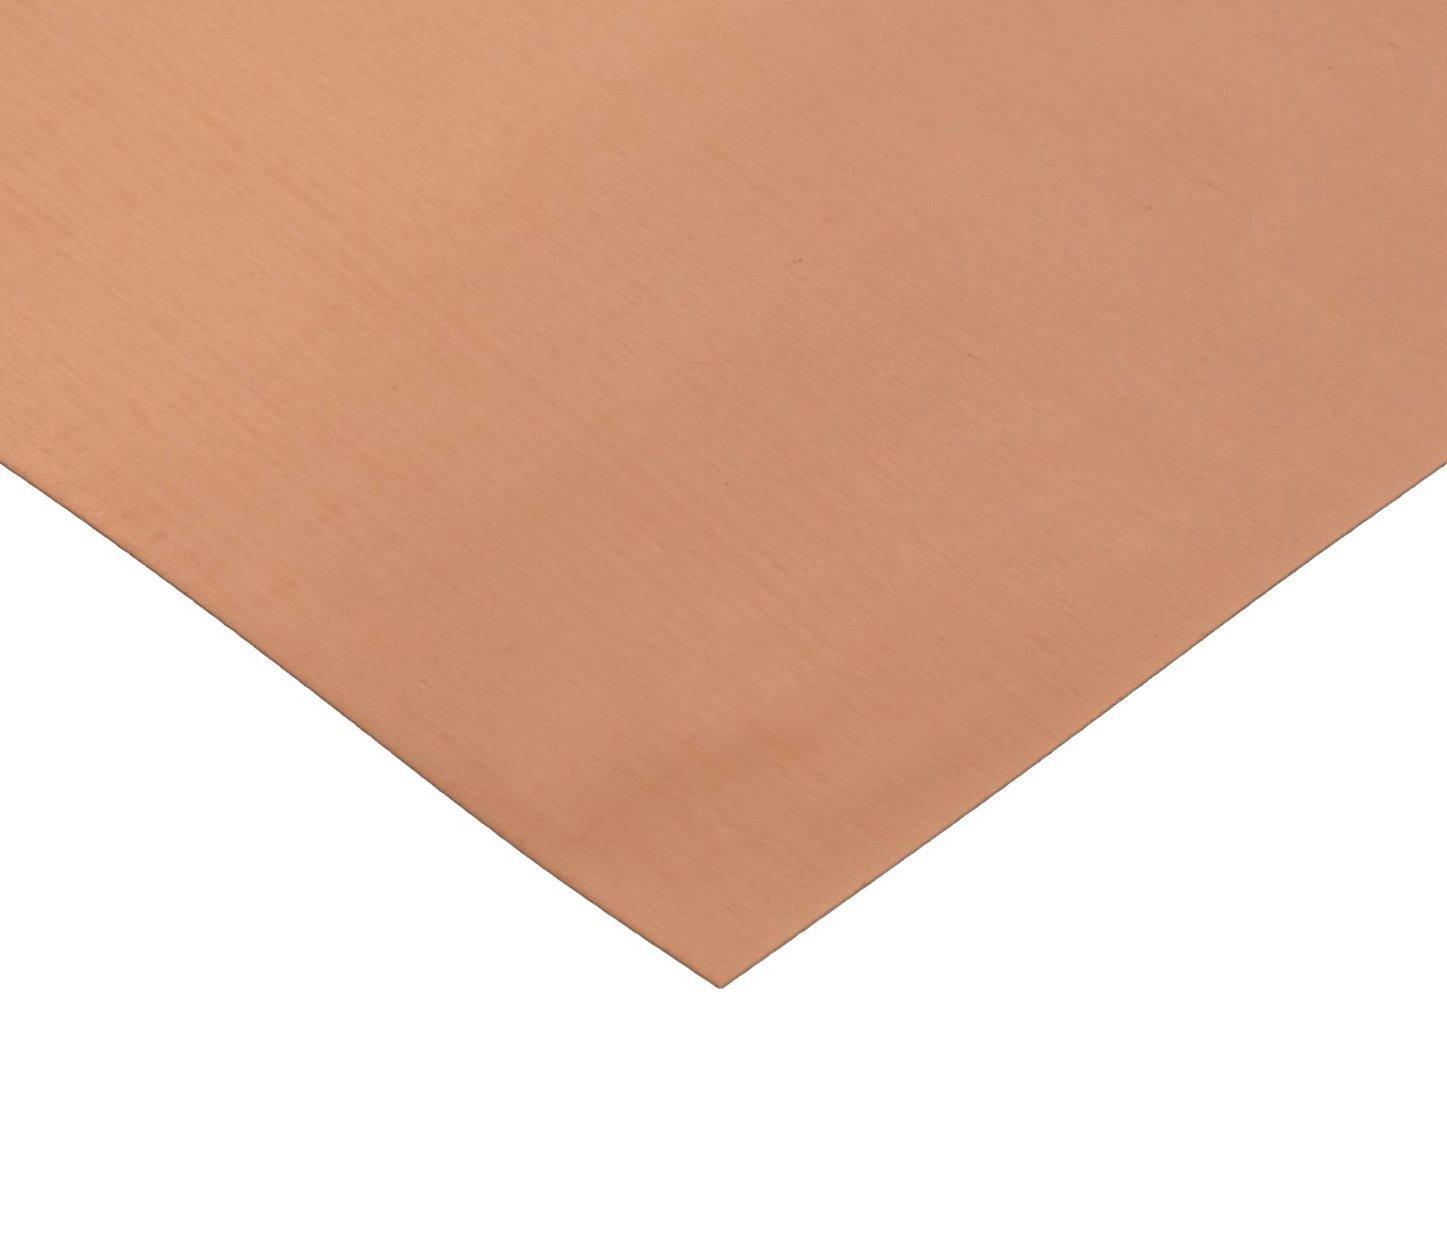 RMP 110 Copper Sheet - 12 Inch x 12 Inch x 0.064 Inch Thickness (48 Oz.) 1/8 Hd by RMP